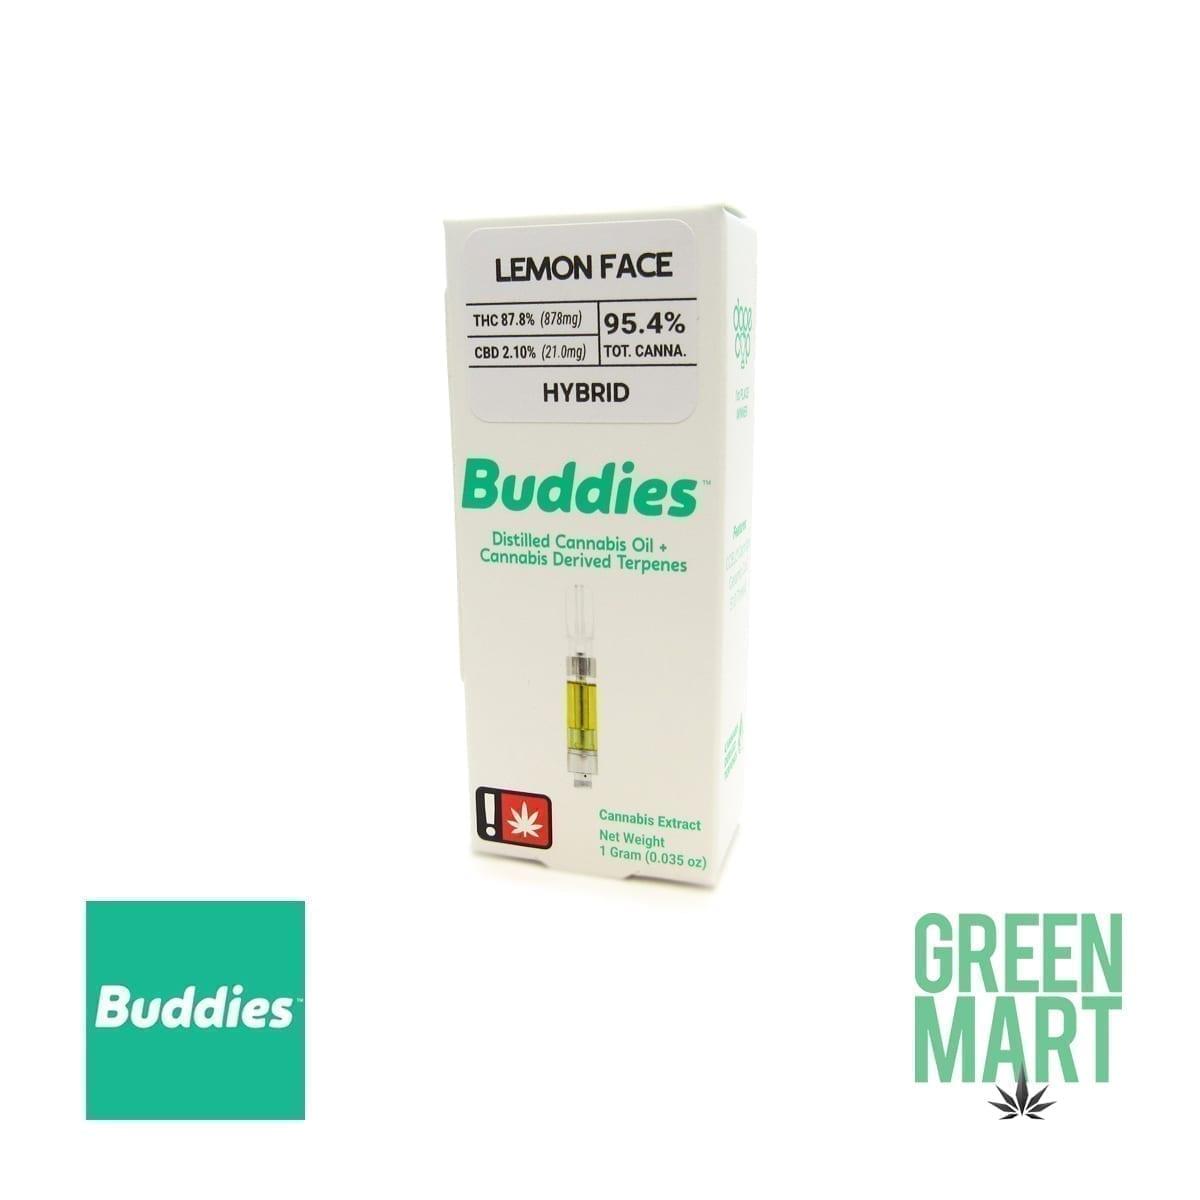 Buddies Brand Distillate Cartridge - Lemon Face